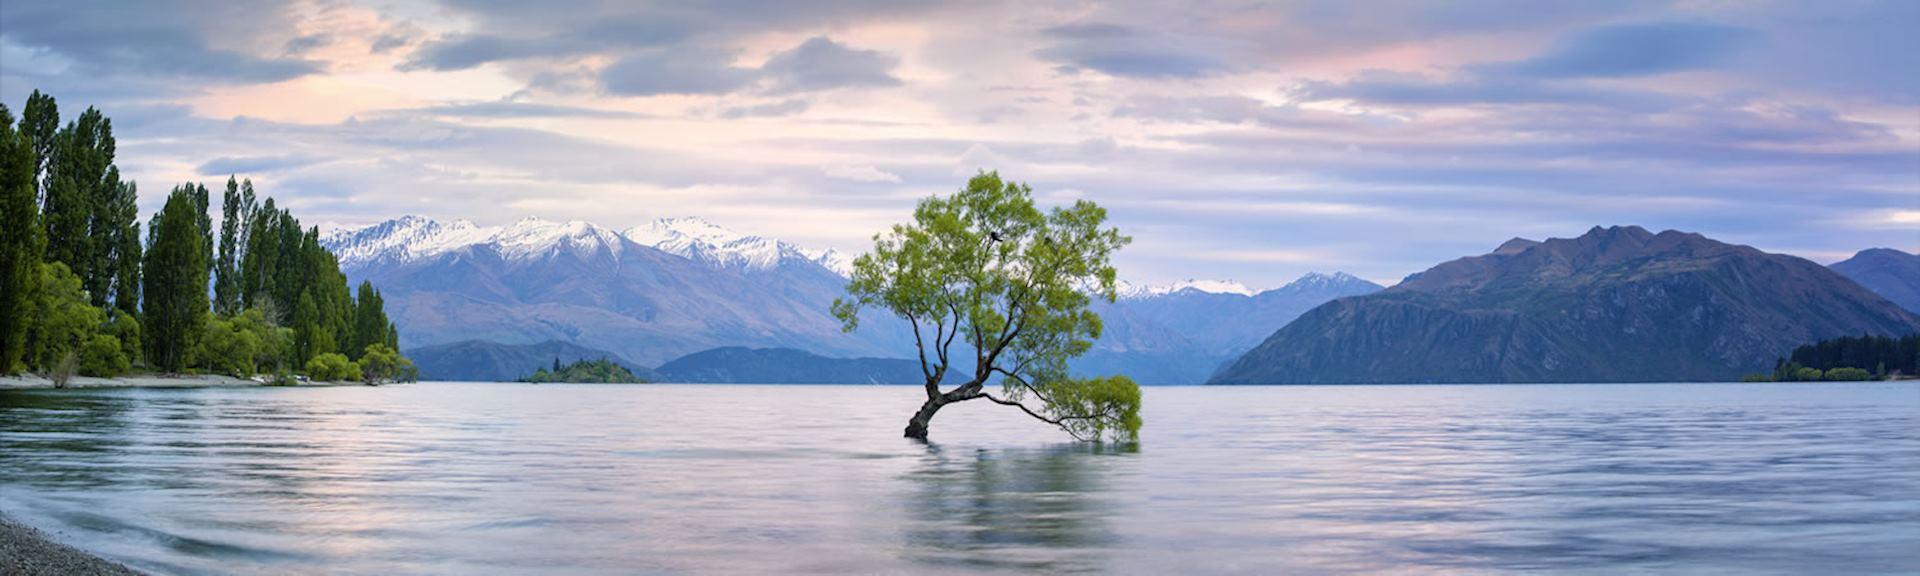 Lake Wanaka, South Island